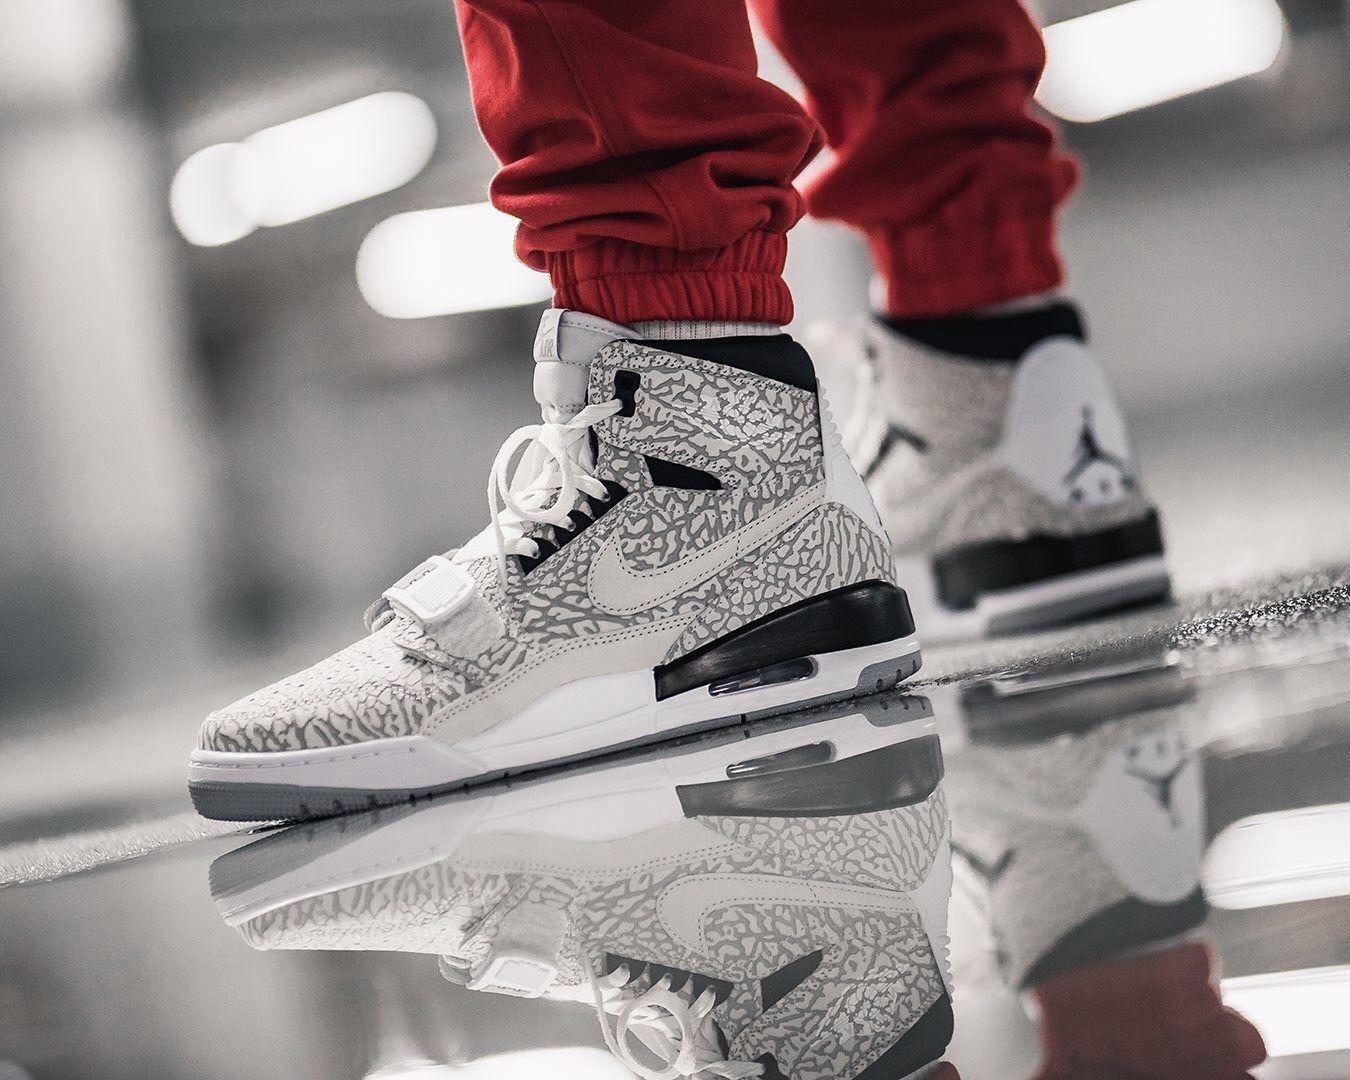 Nike Air Jordan Legacy 312 Air Jordans Sneakers Jordans